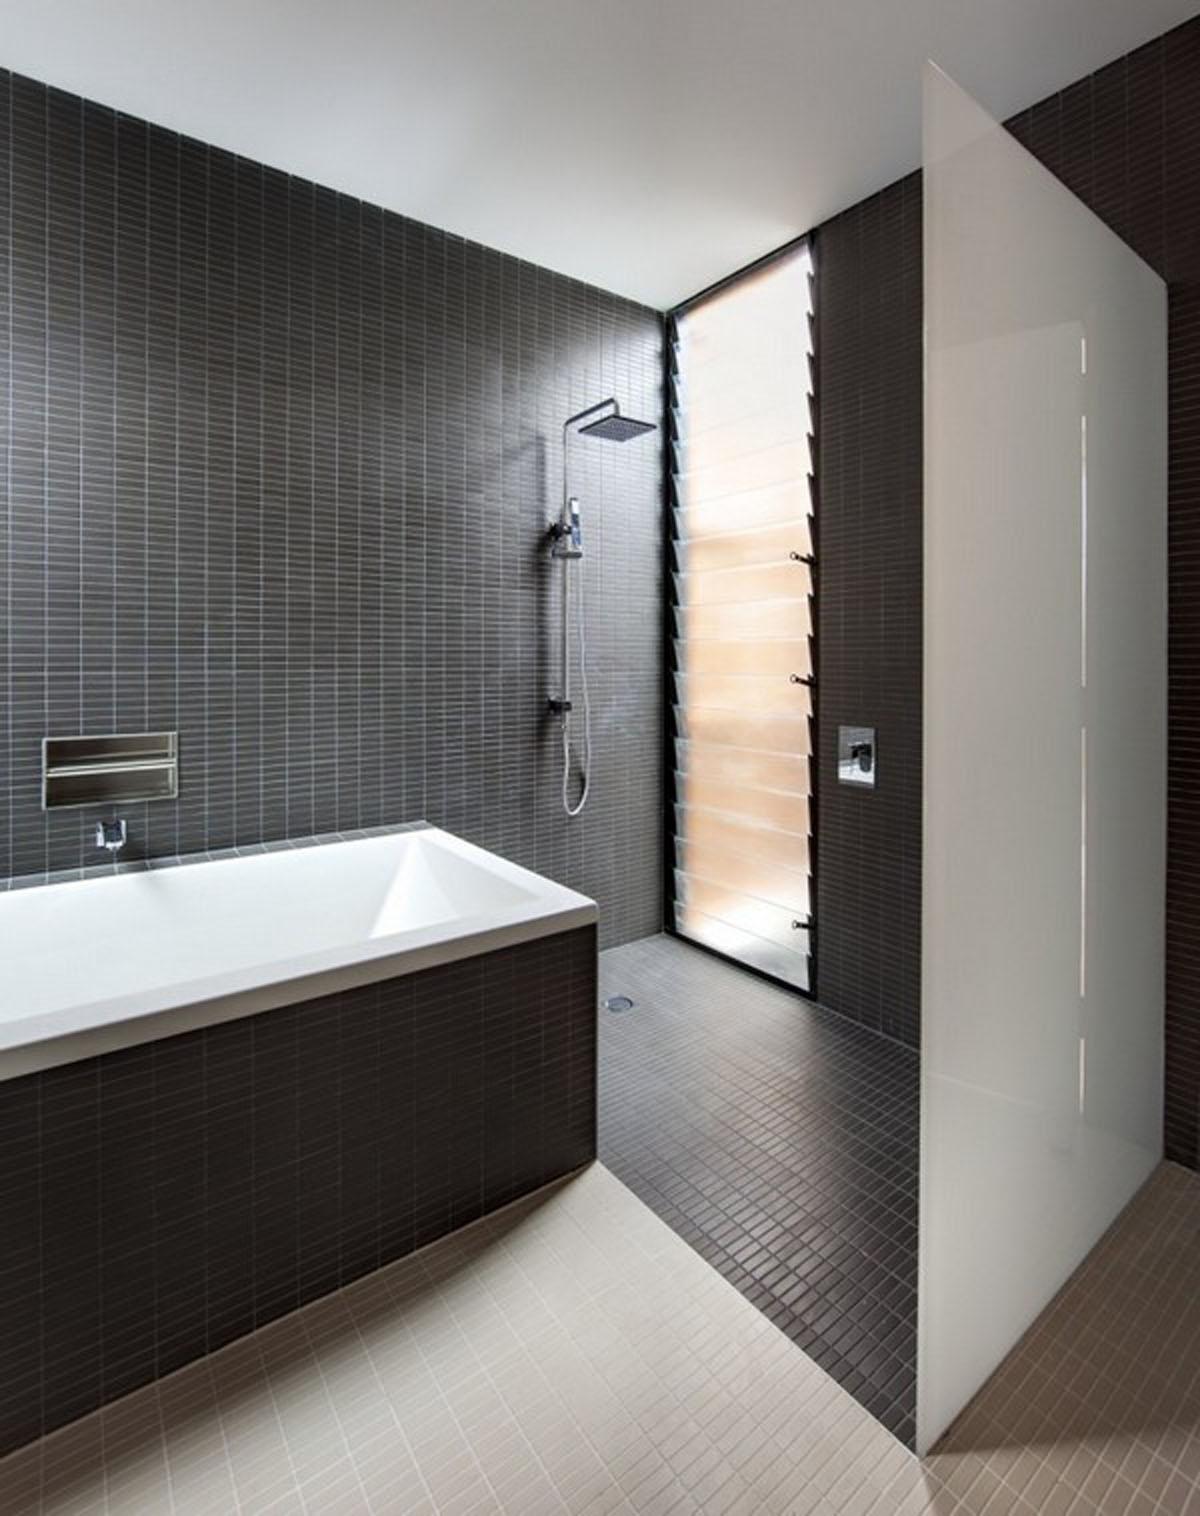 bathroom interior design - viskas apie interjerą